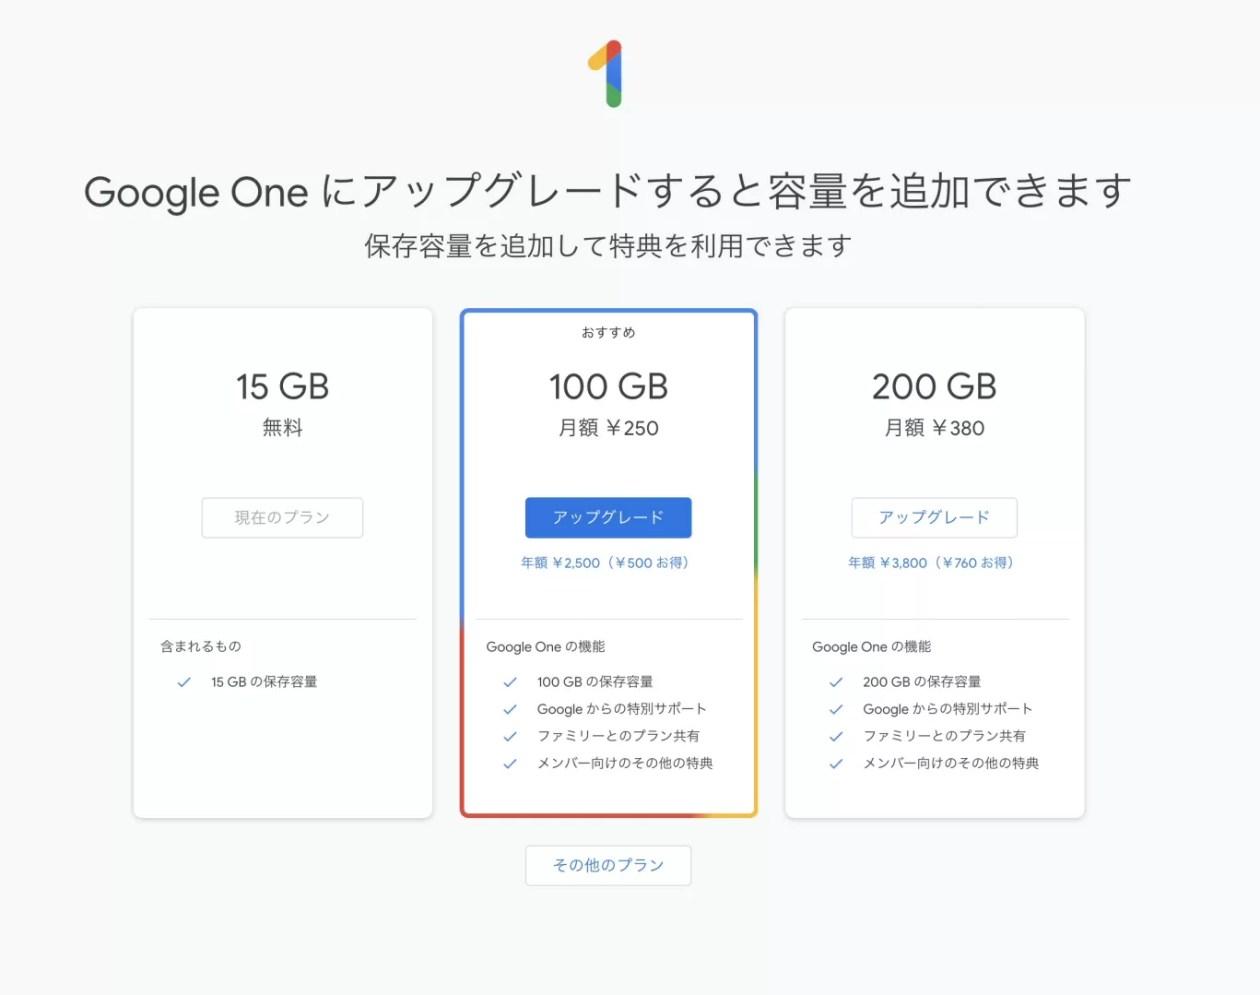 Google One2